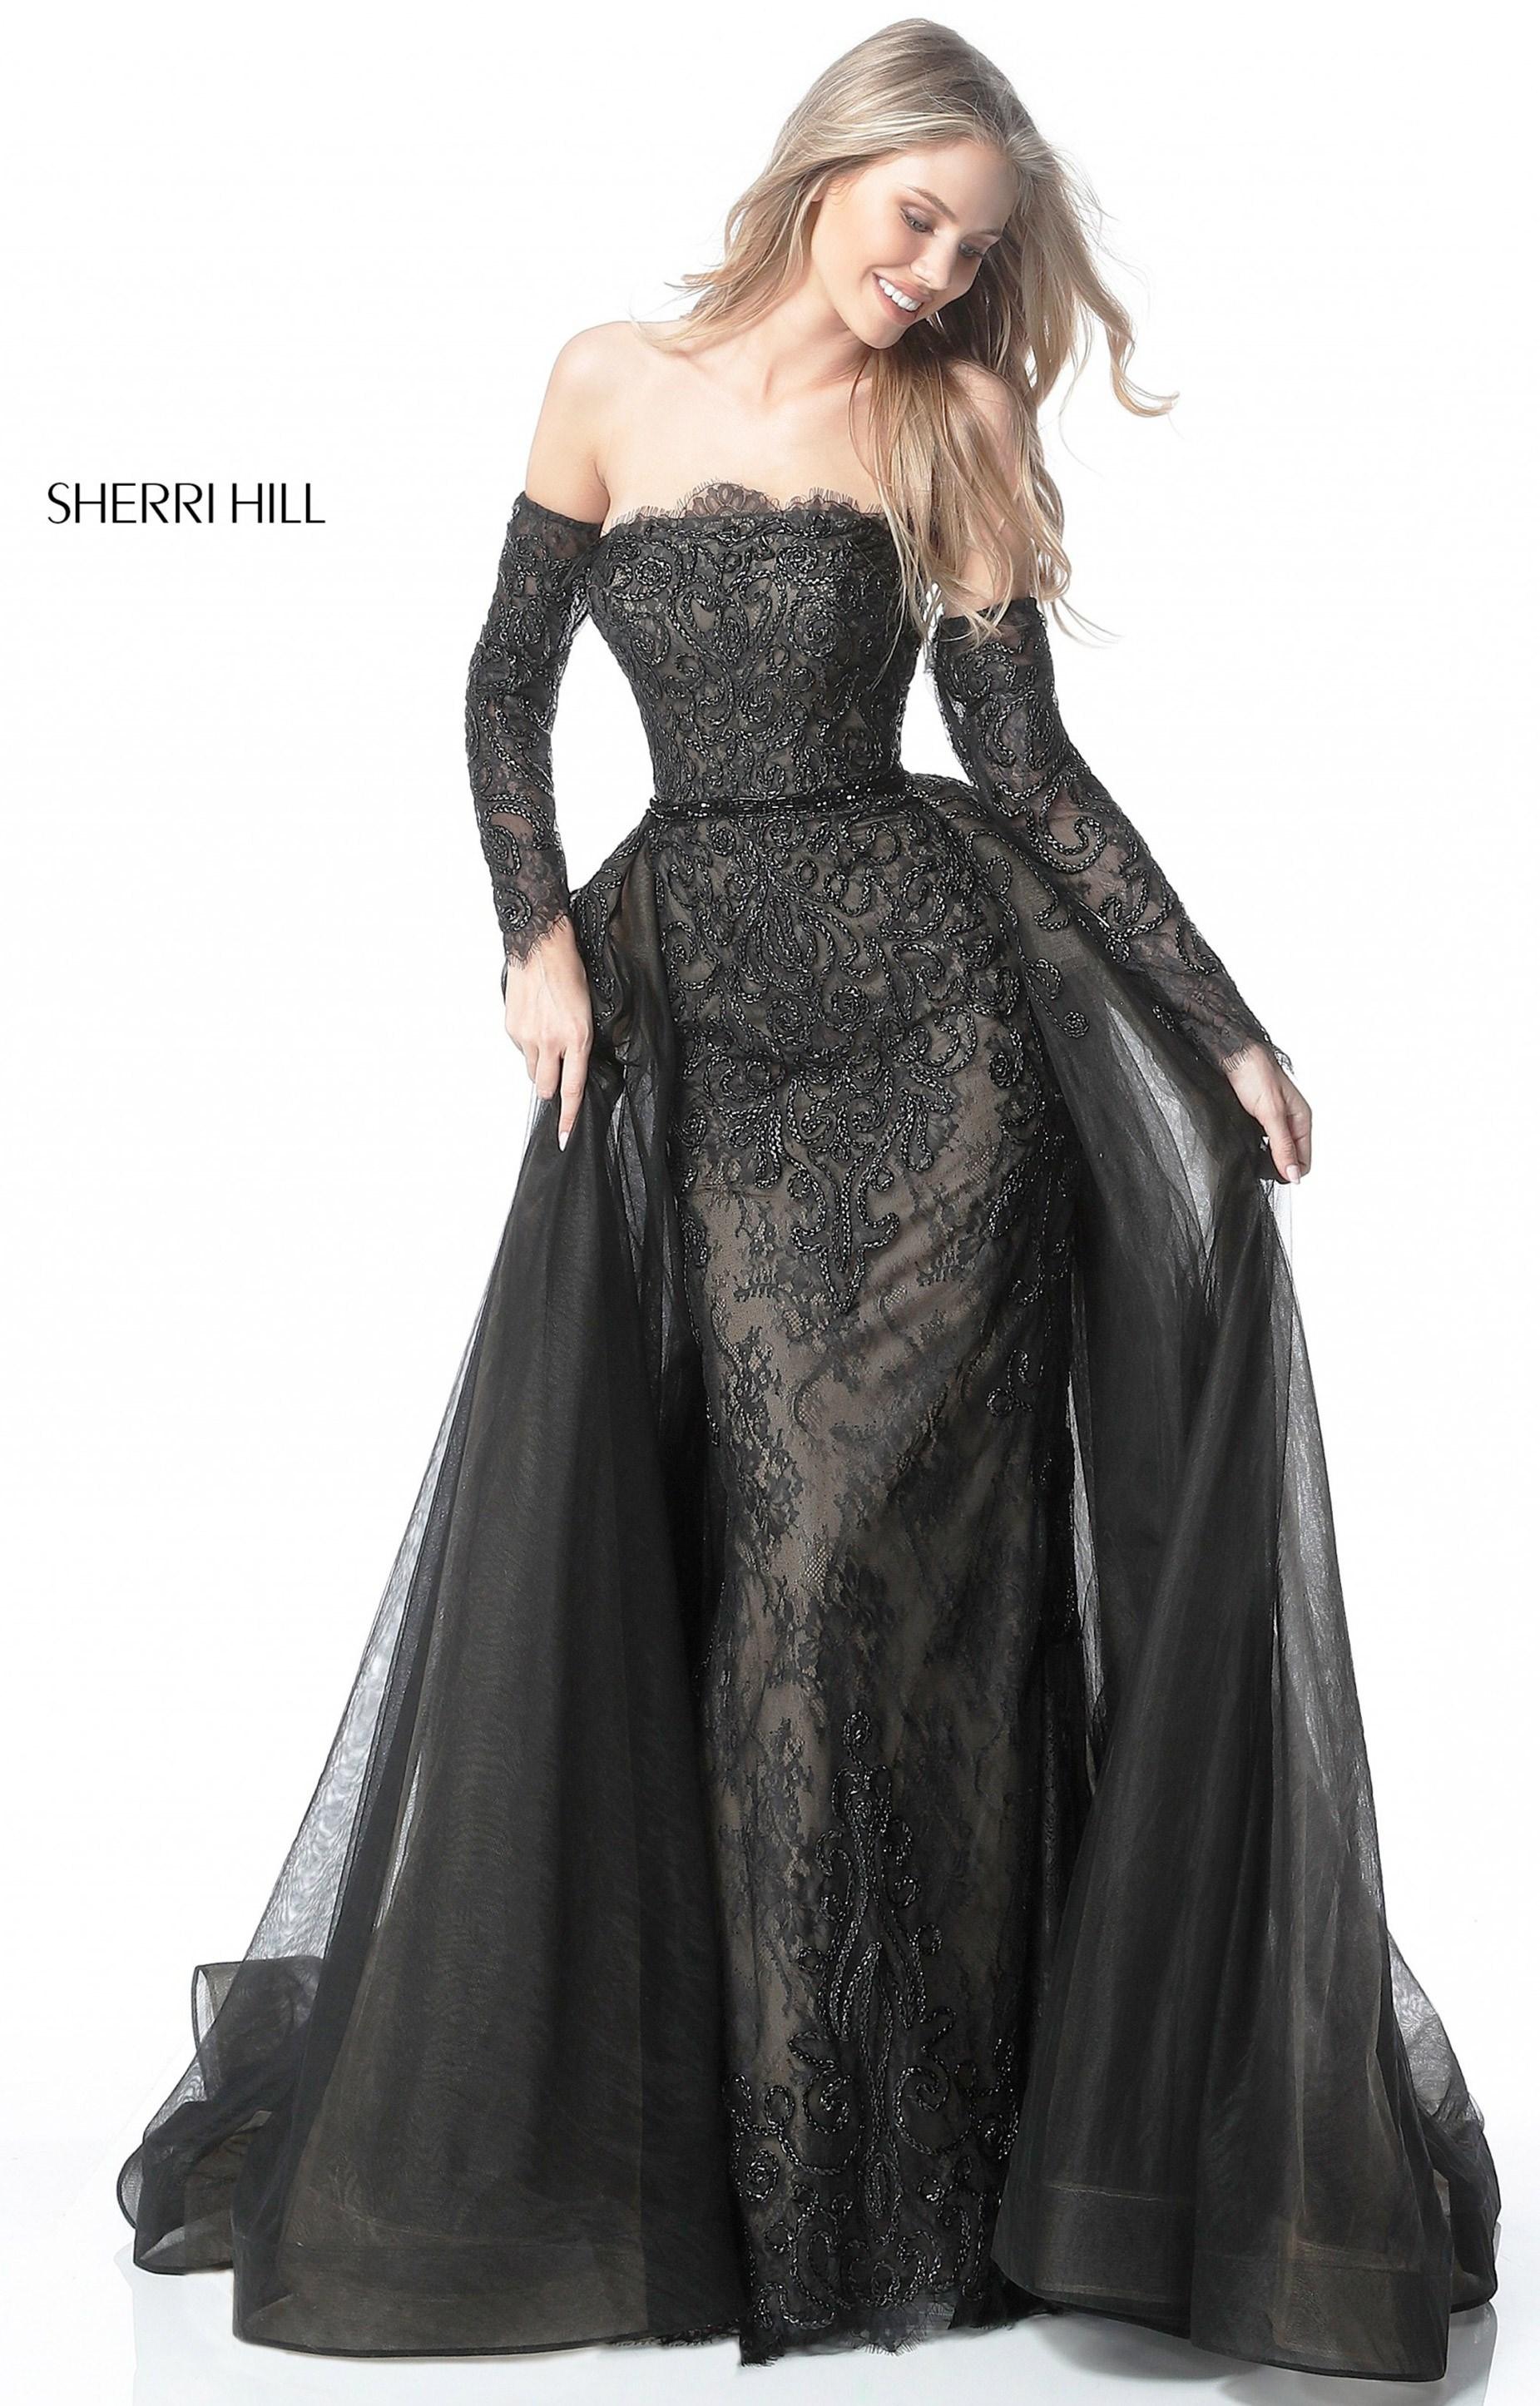 Sherri Hill 51384 - Long Sleeve Off the Shoulder Lace Prom Dress